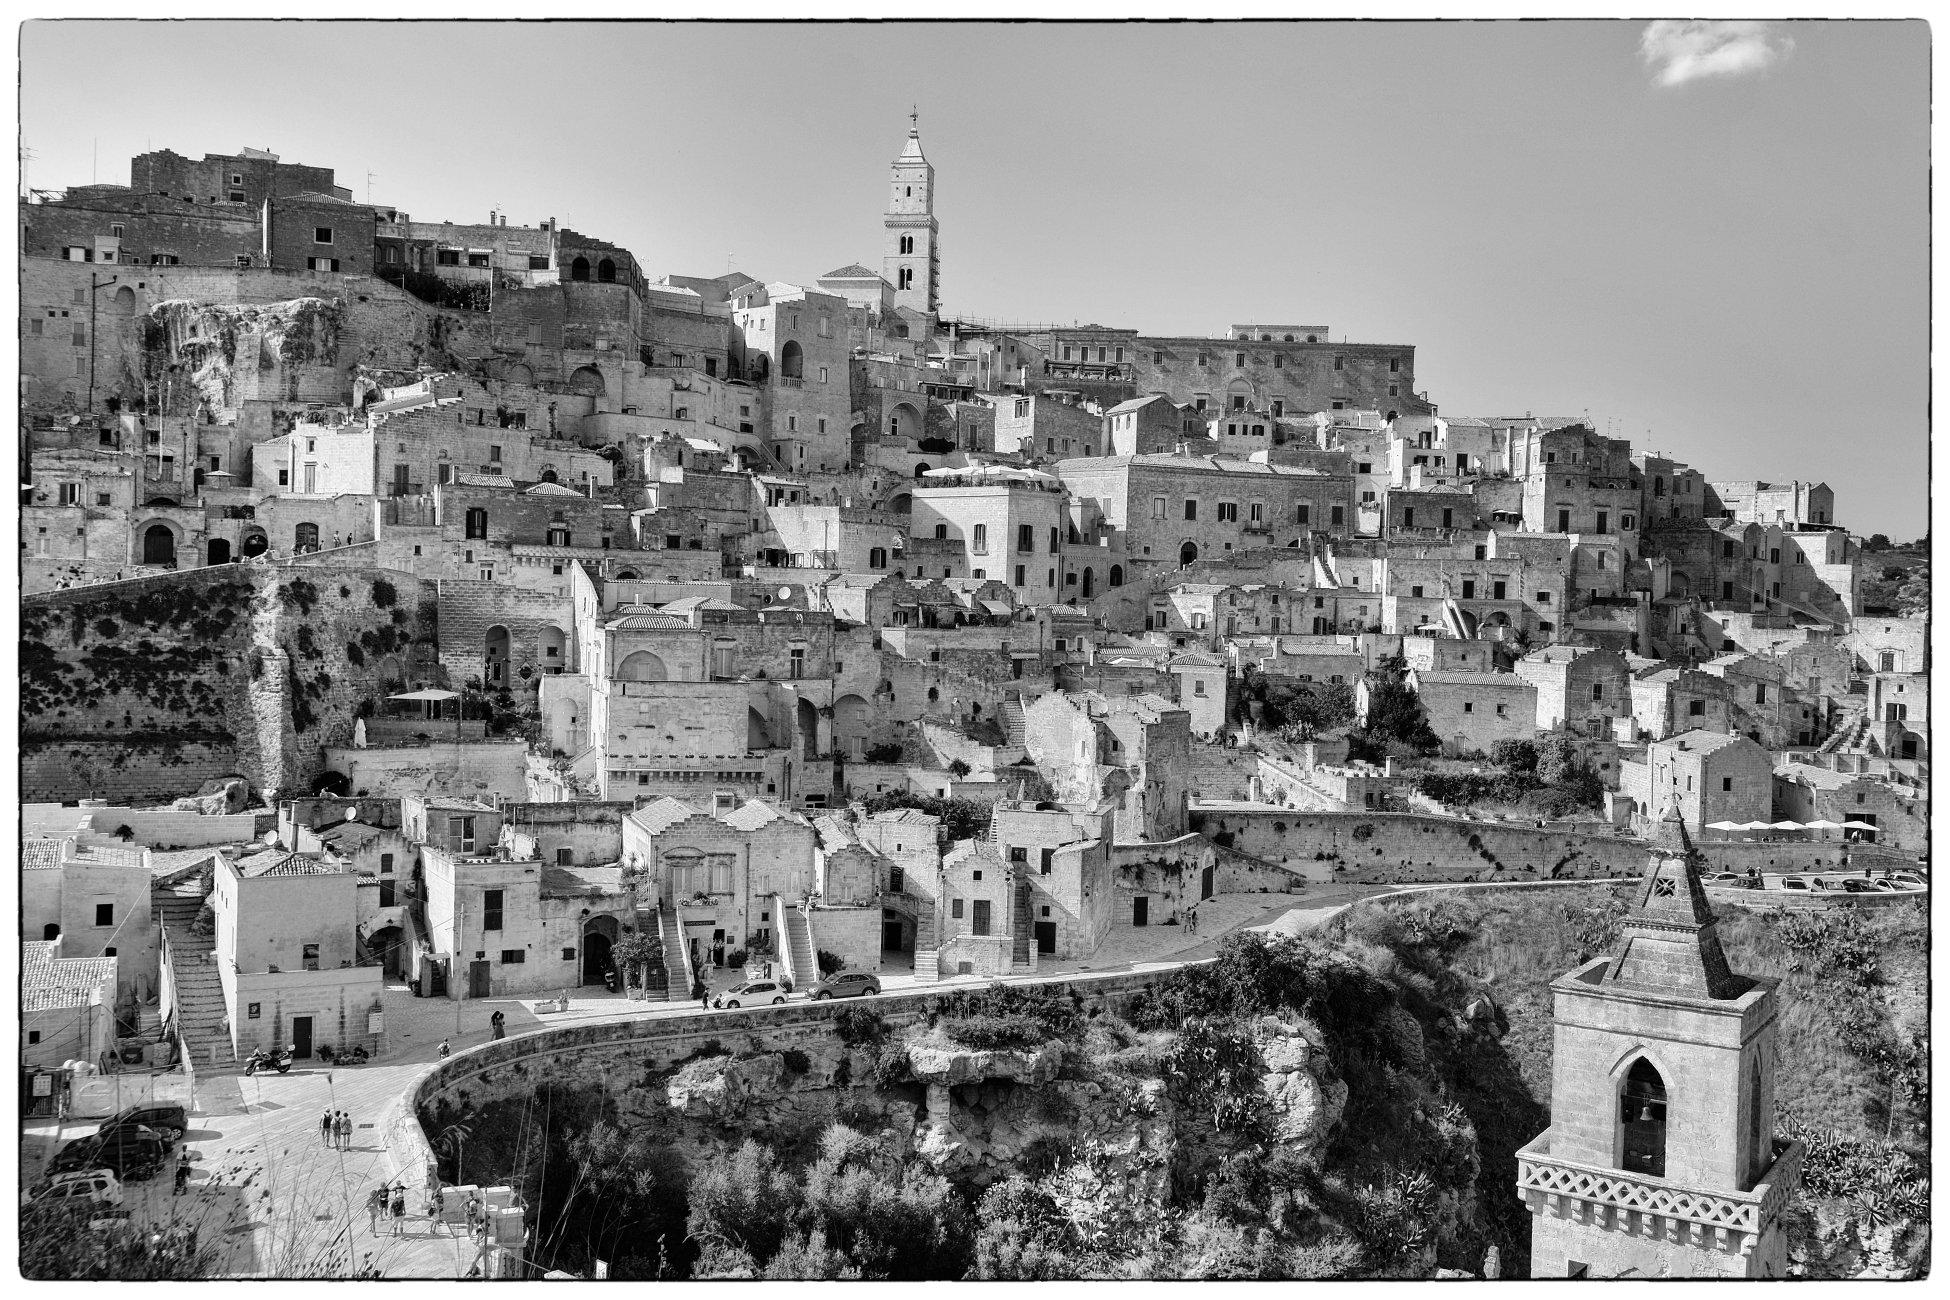 World Heritage Site Matera